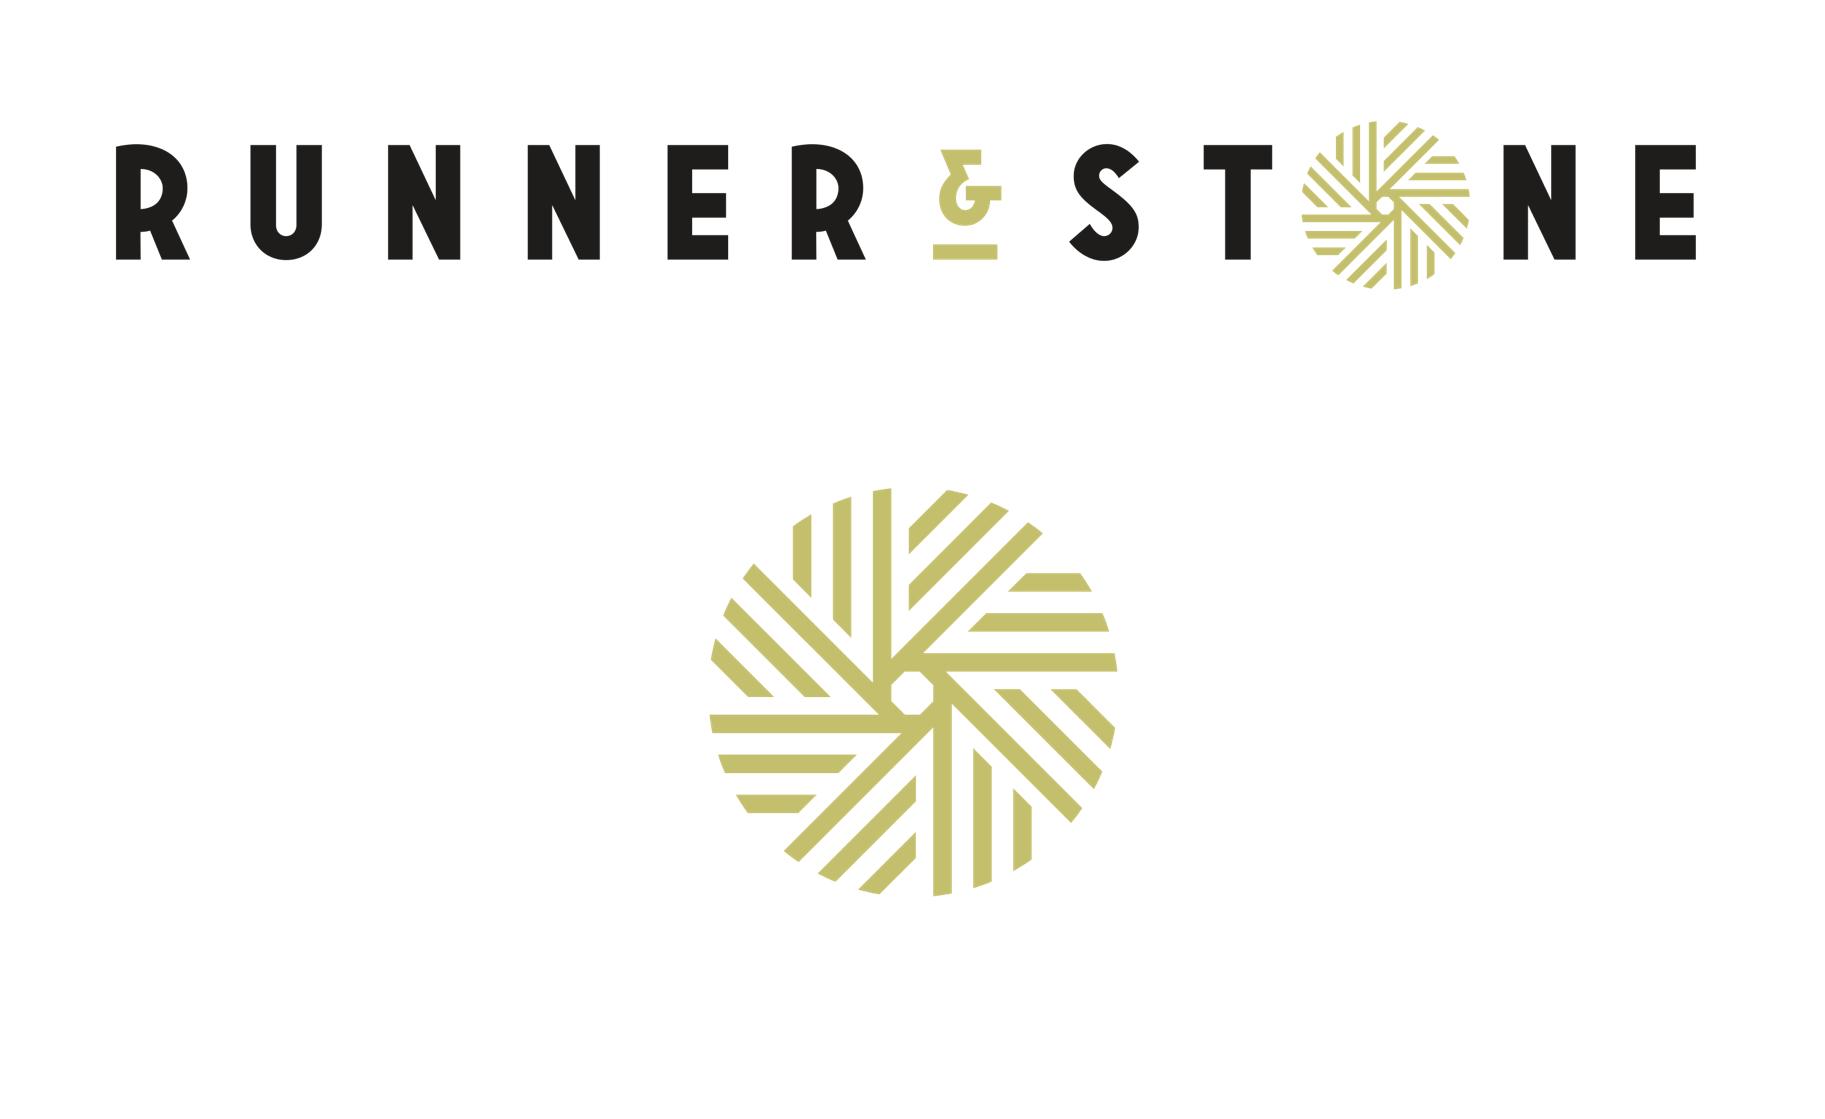 Final Runner and Stone logo design.